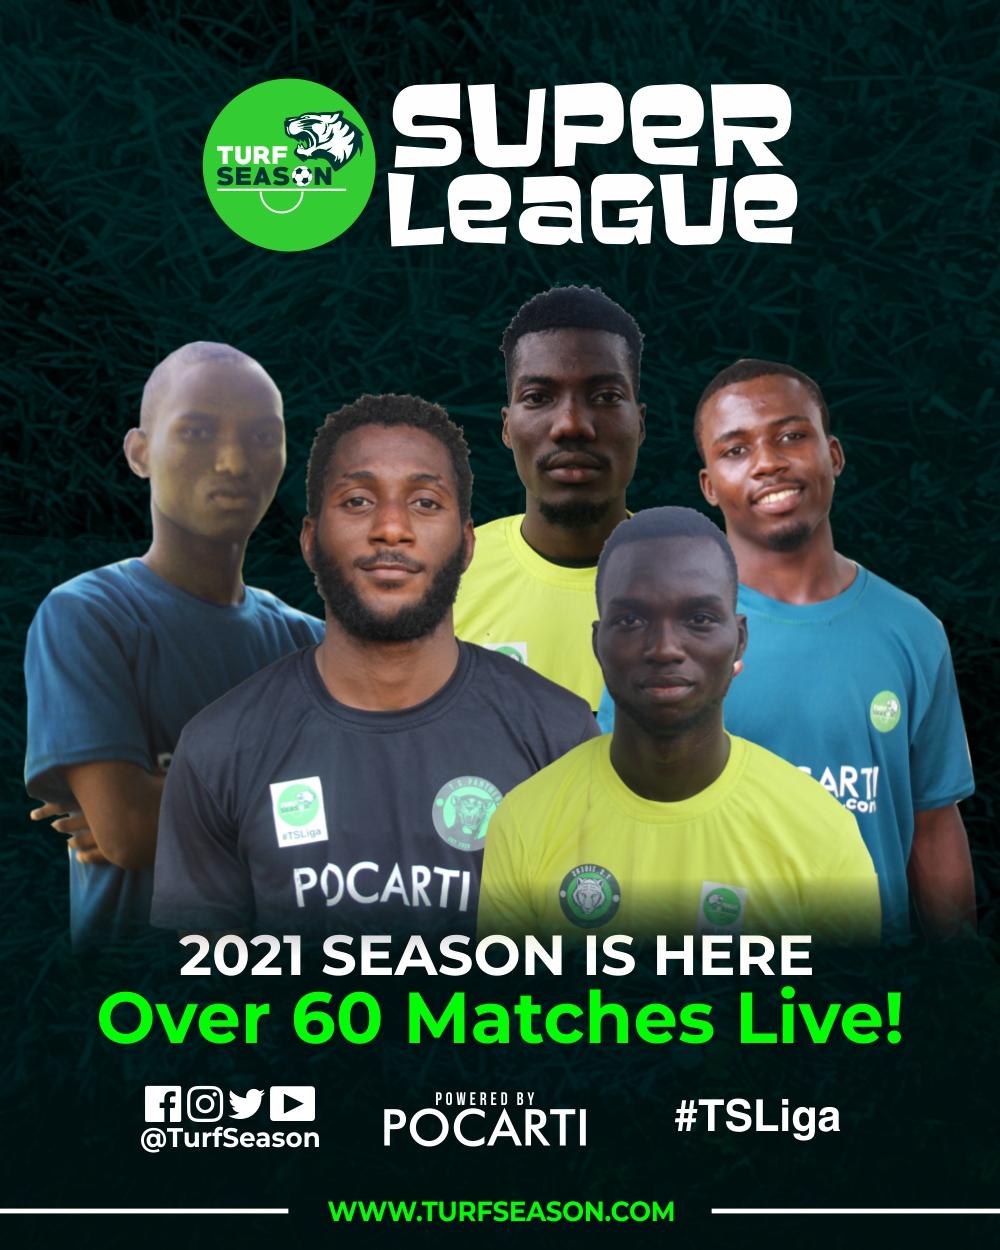 Turf Season Super League 2021